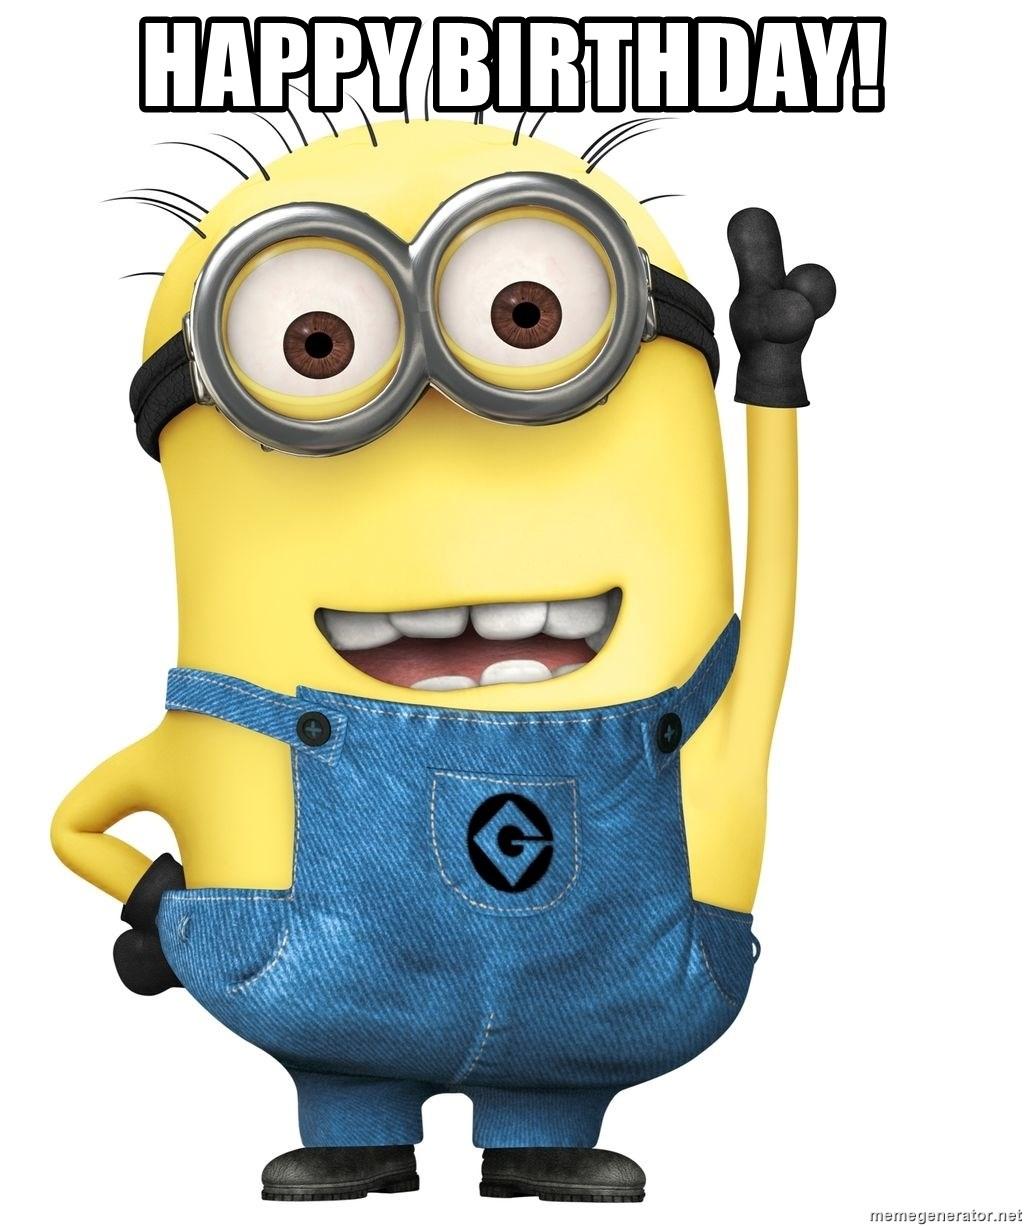 Happy Birthday Despicable Me Minion Meme Generator